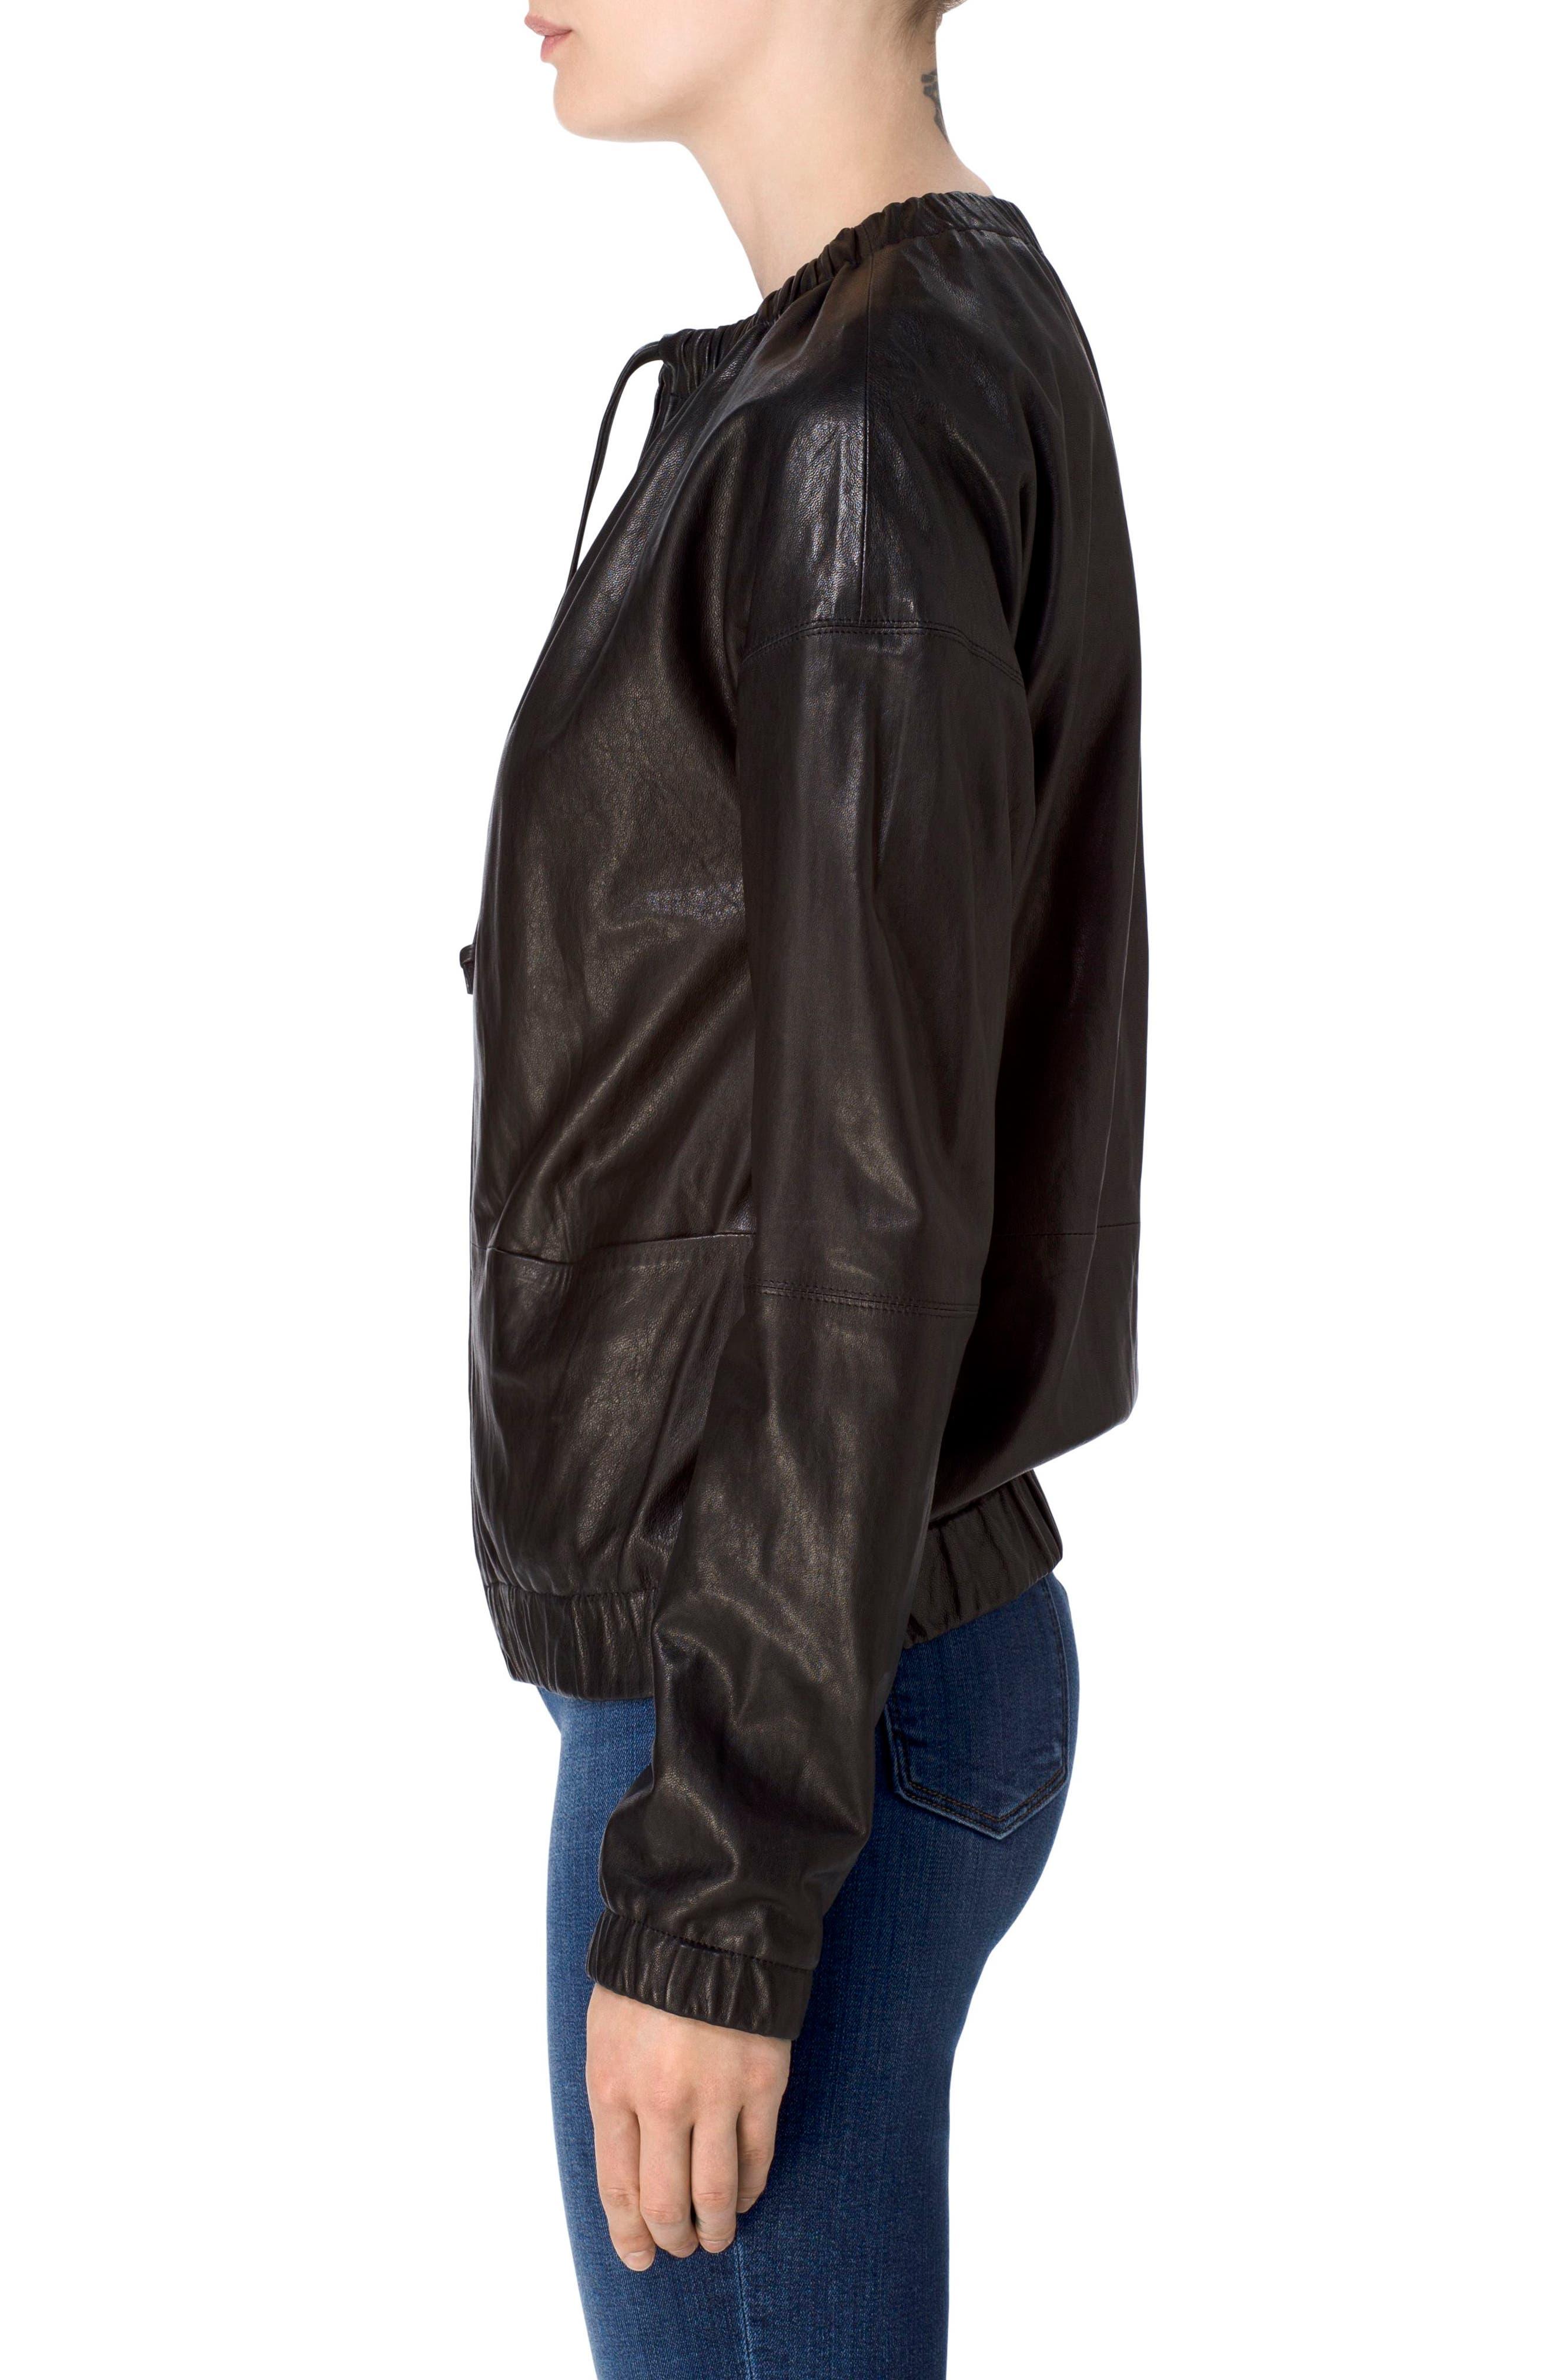 Baez Leather Bomber Jacket,                             Alternate thumbnail 3, color,                             Black